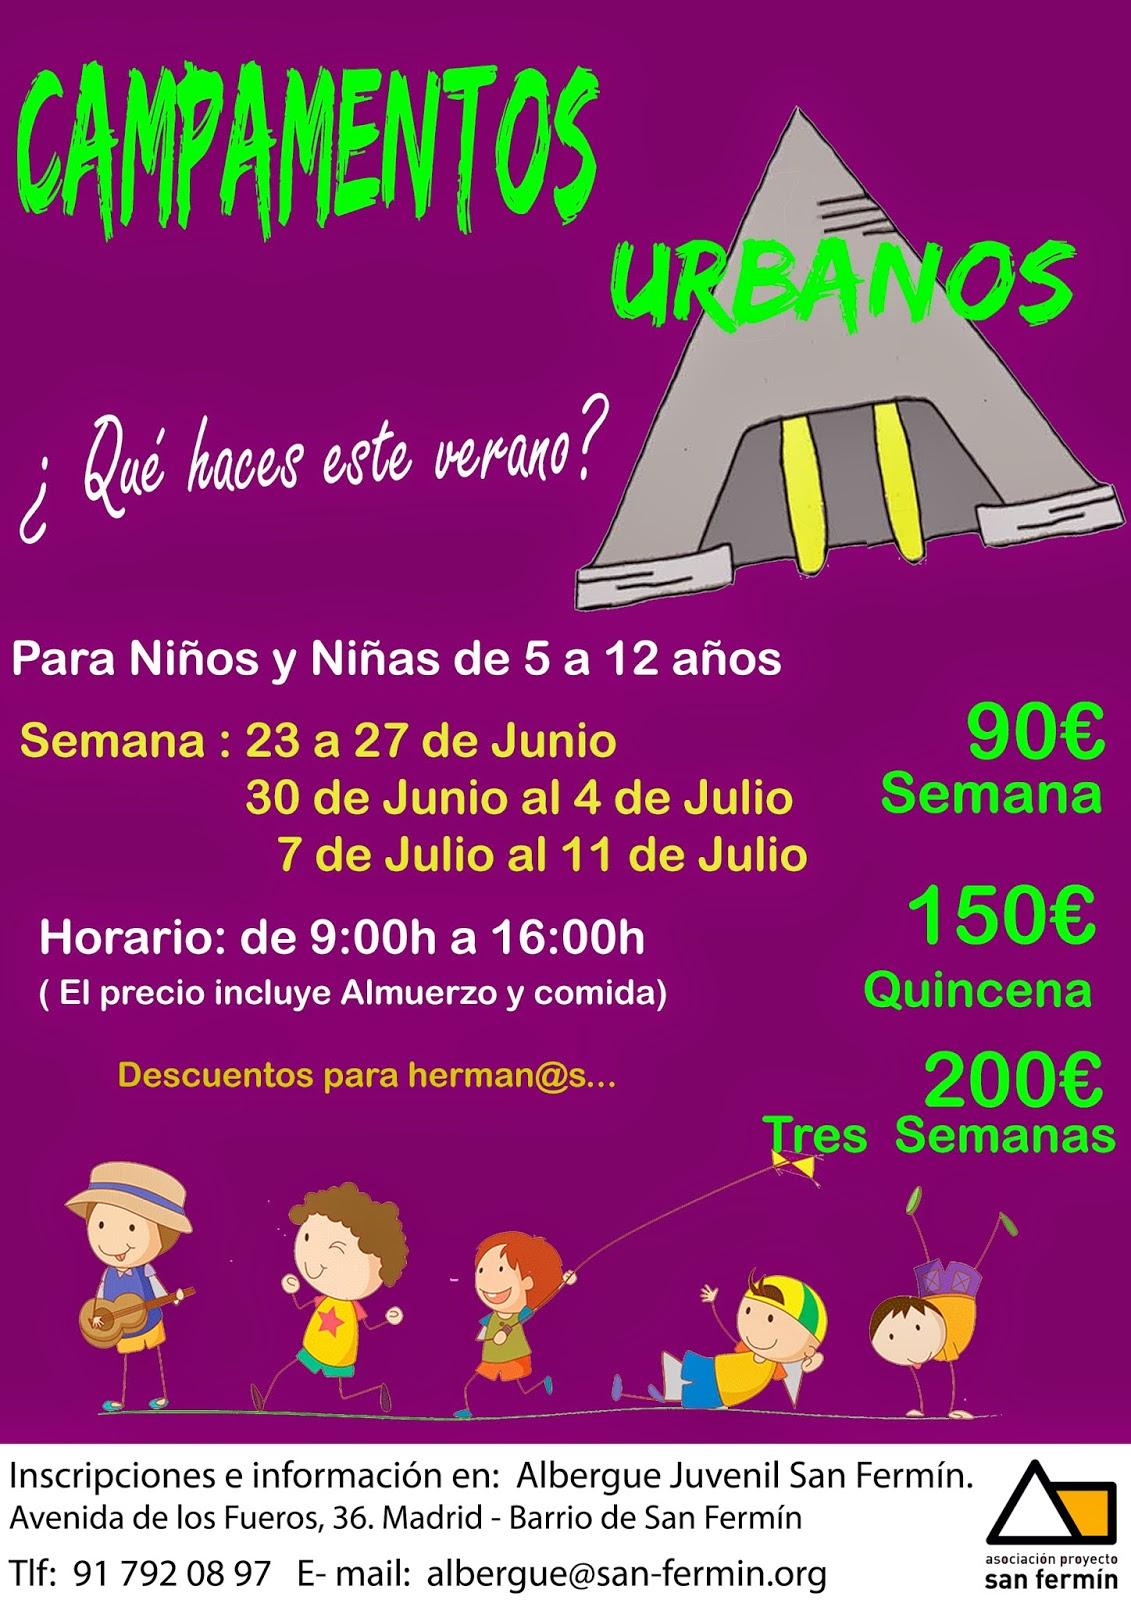 Campamentos Urbanos Albergue Juvenil San Fermin